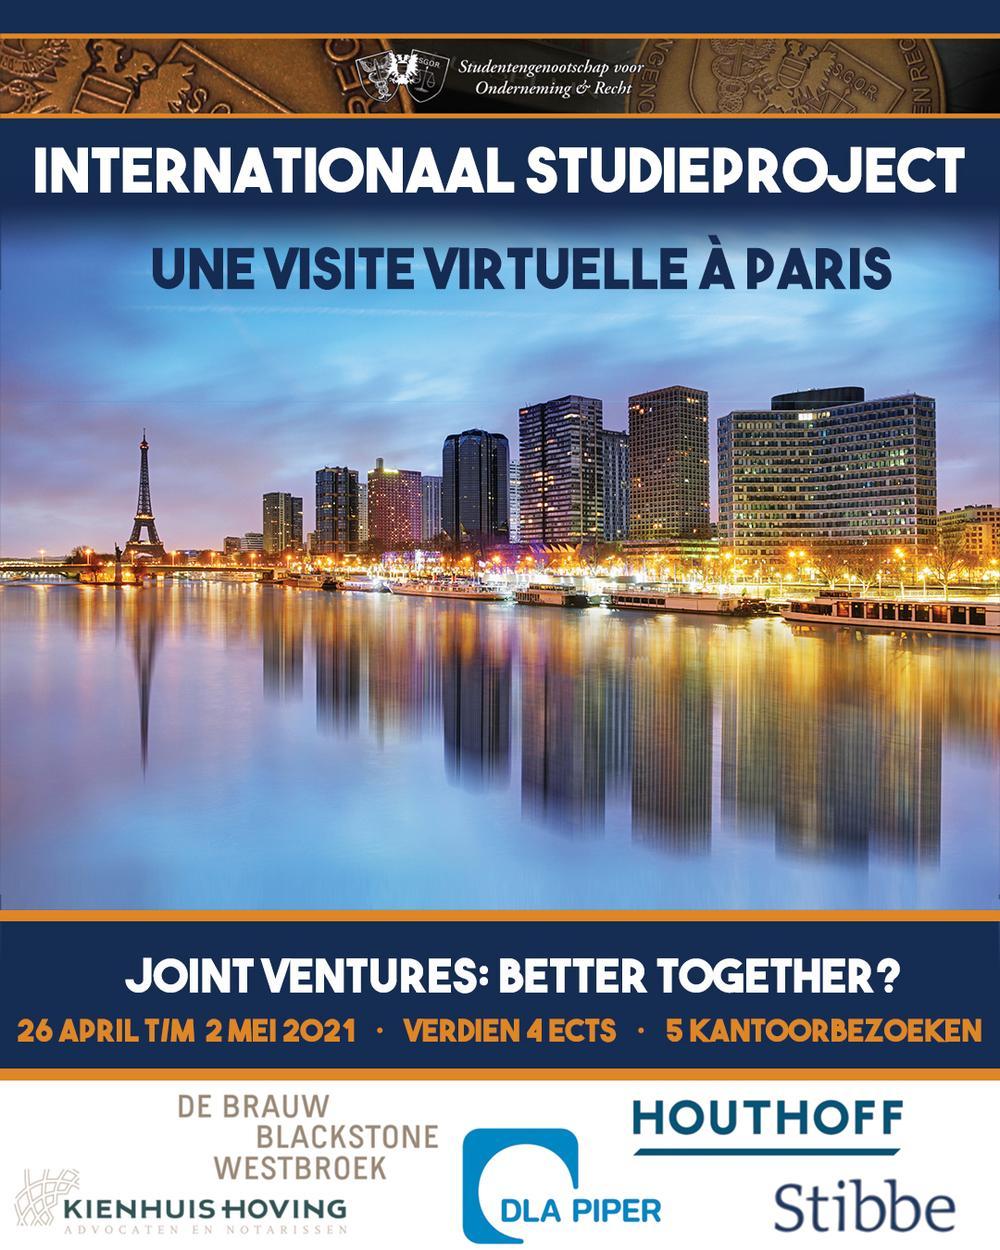 ISP 2021! Joint ventures: Better together?